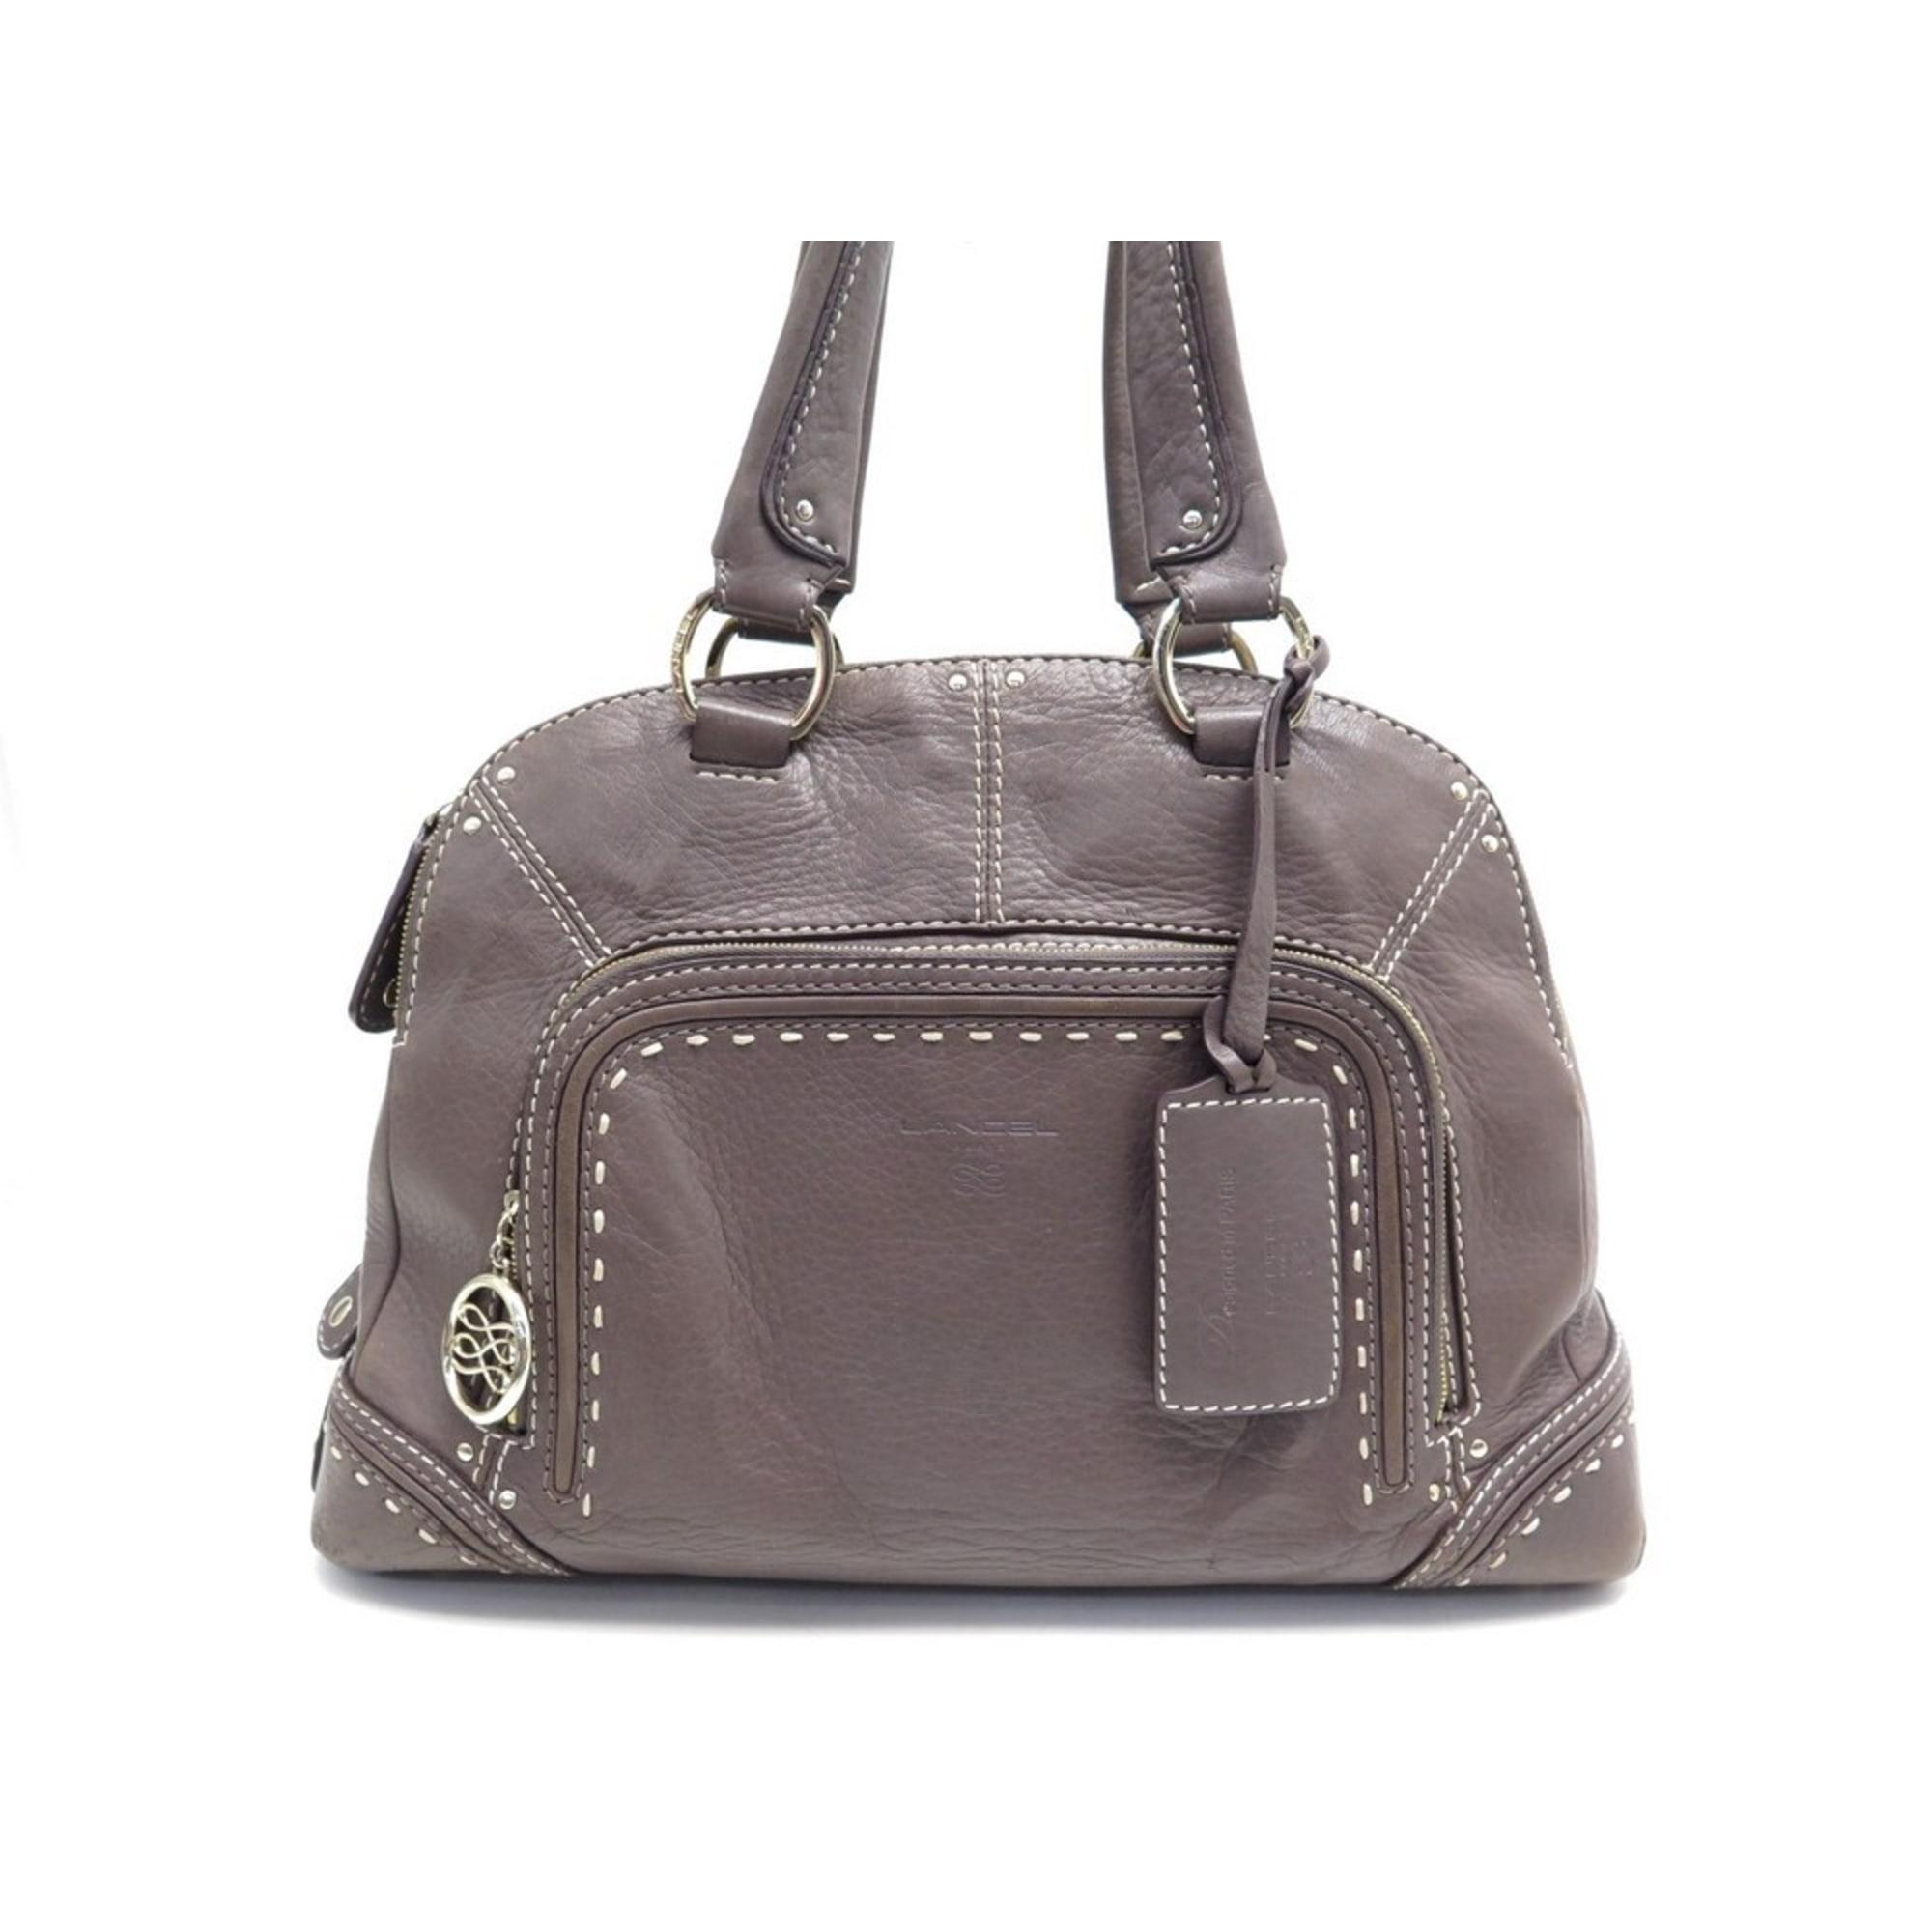 Leather Handbag LANCEL taupe